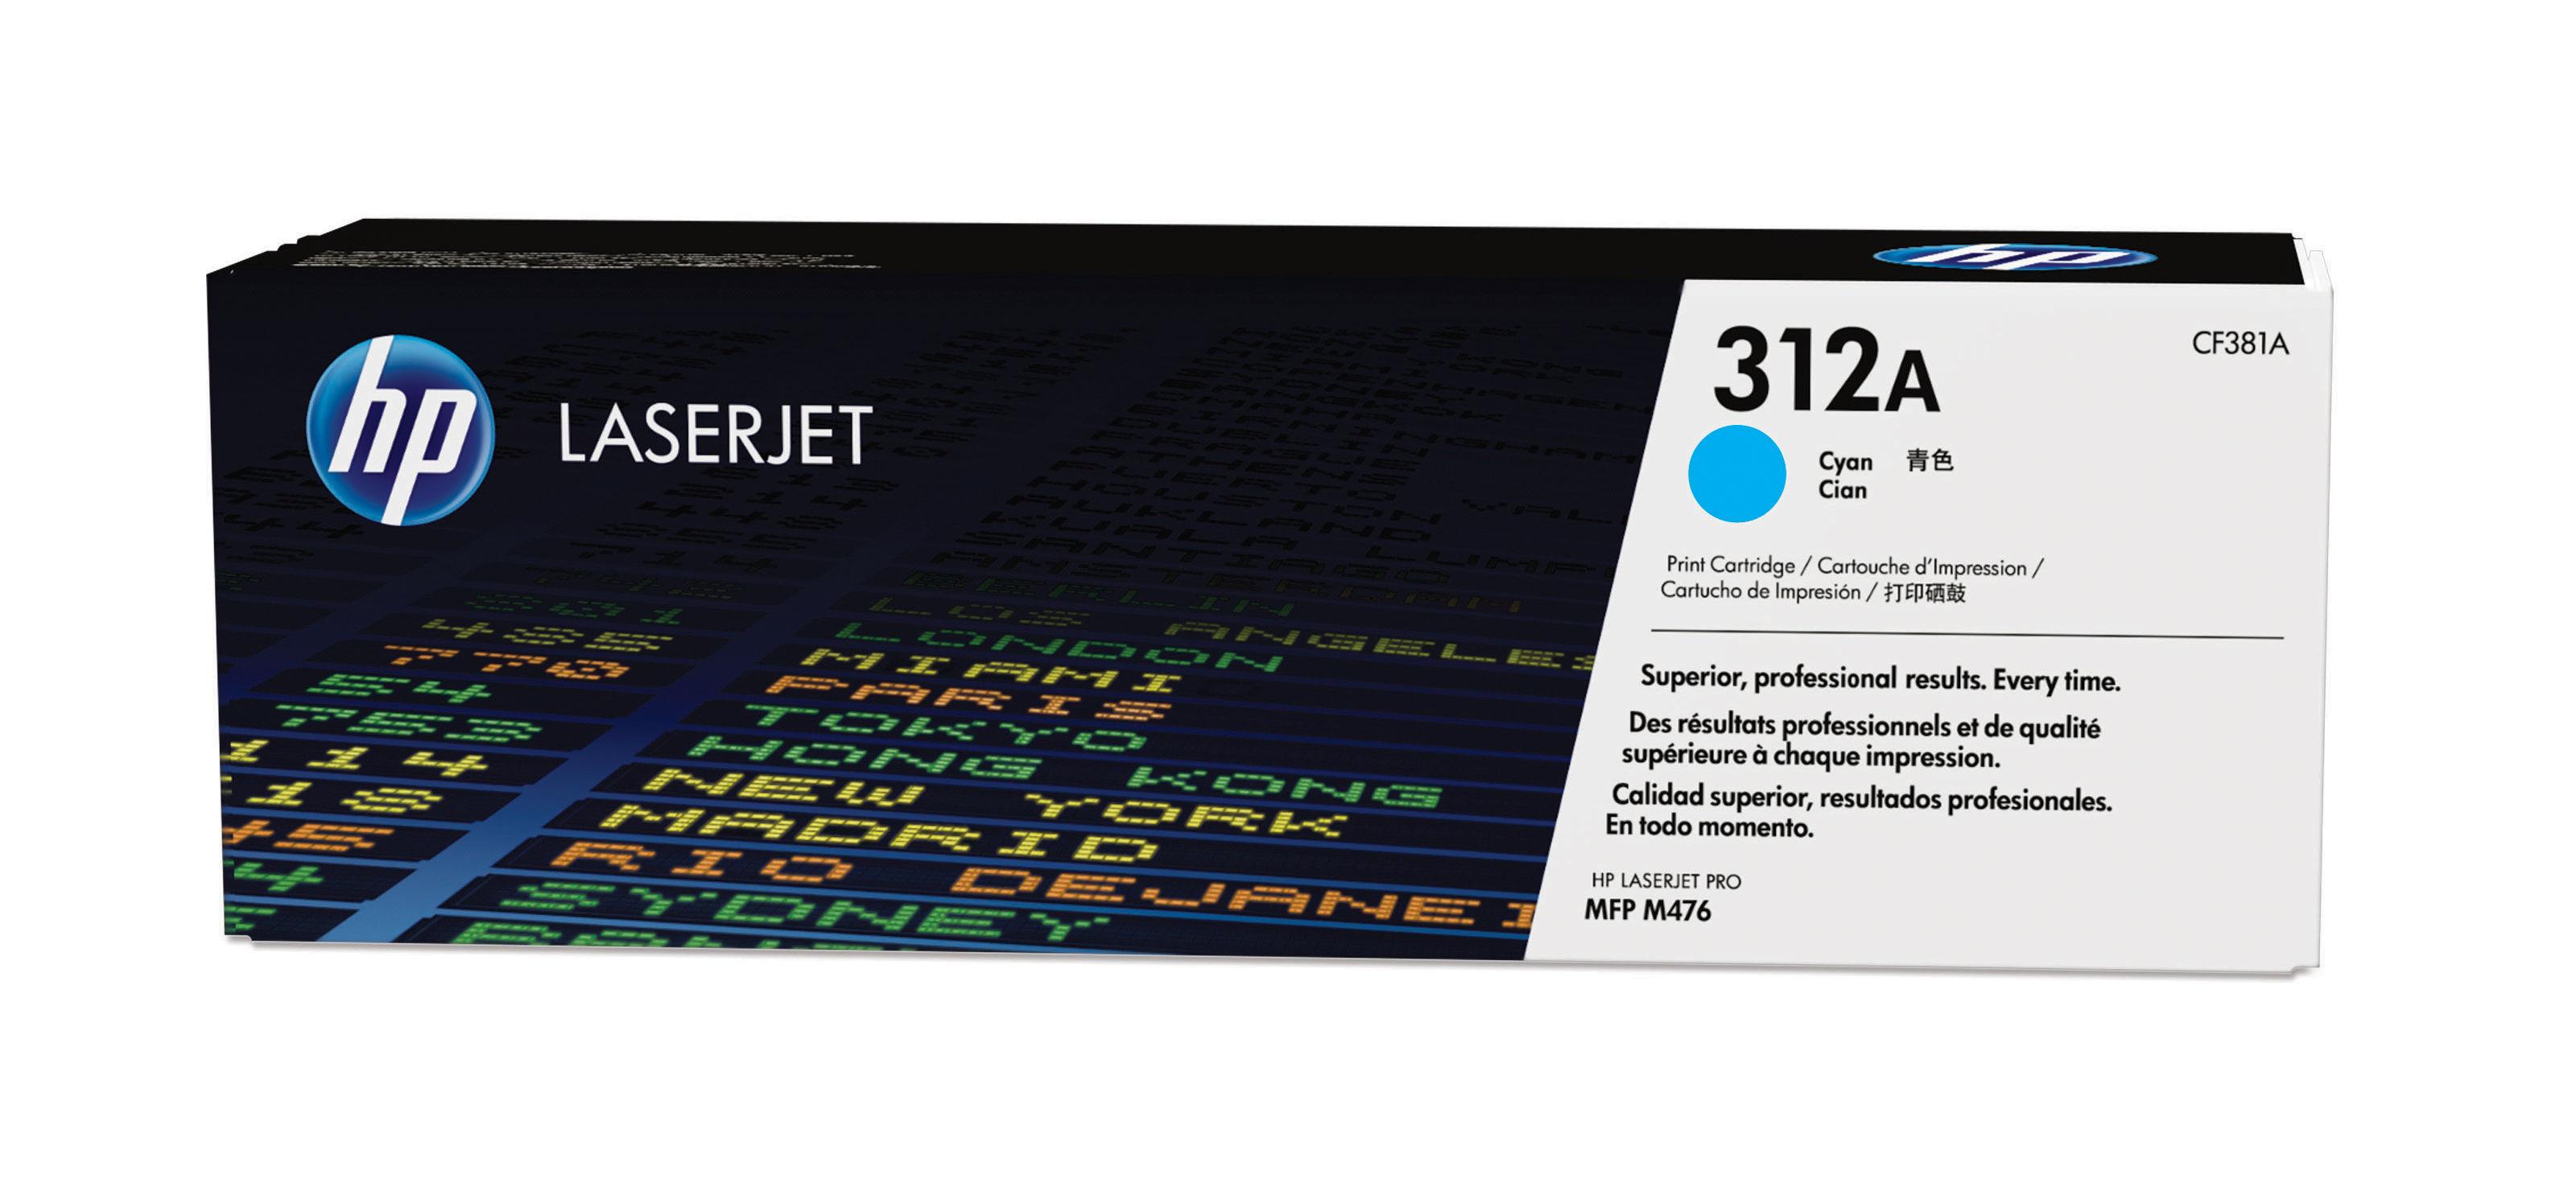 Cf381a HP Hp Cyan Toner Cartridge (312a) - AD01